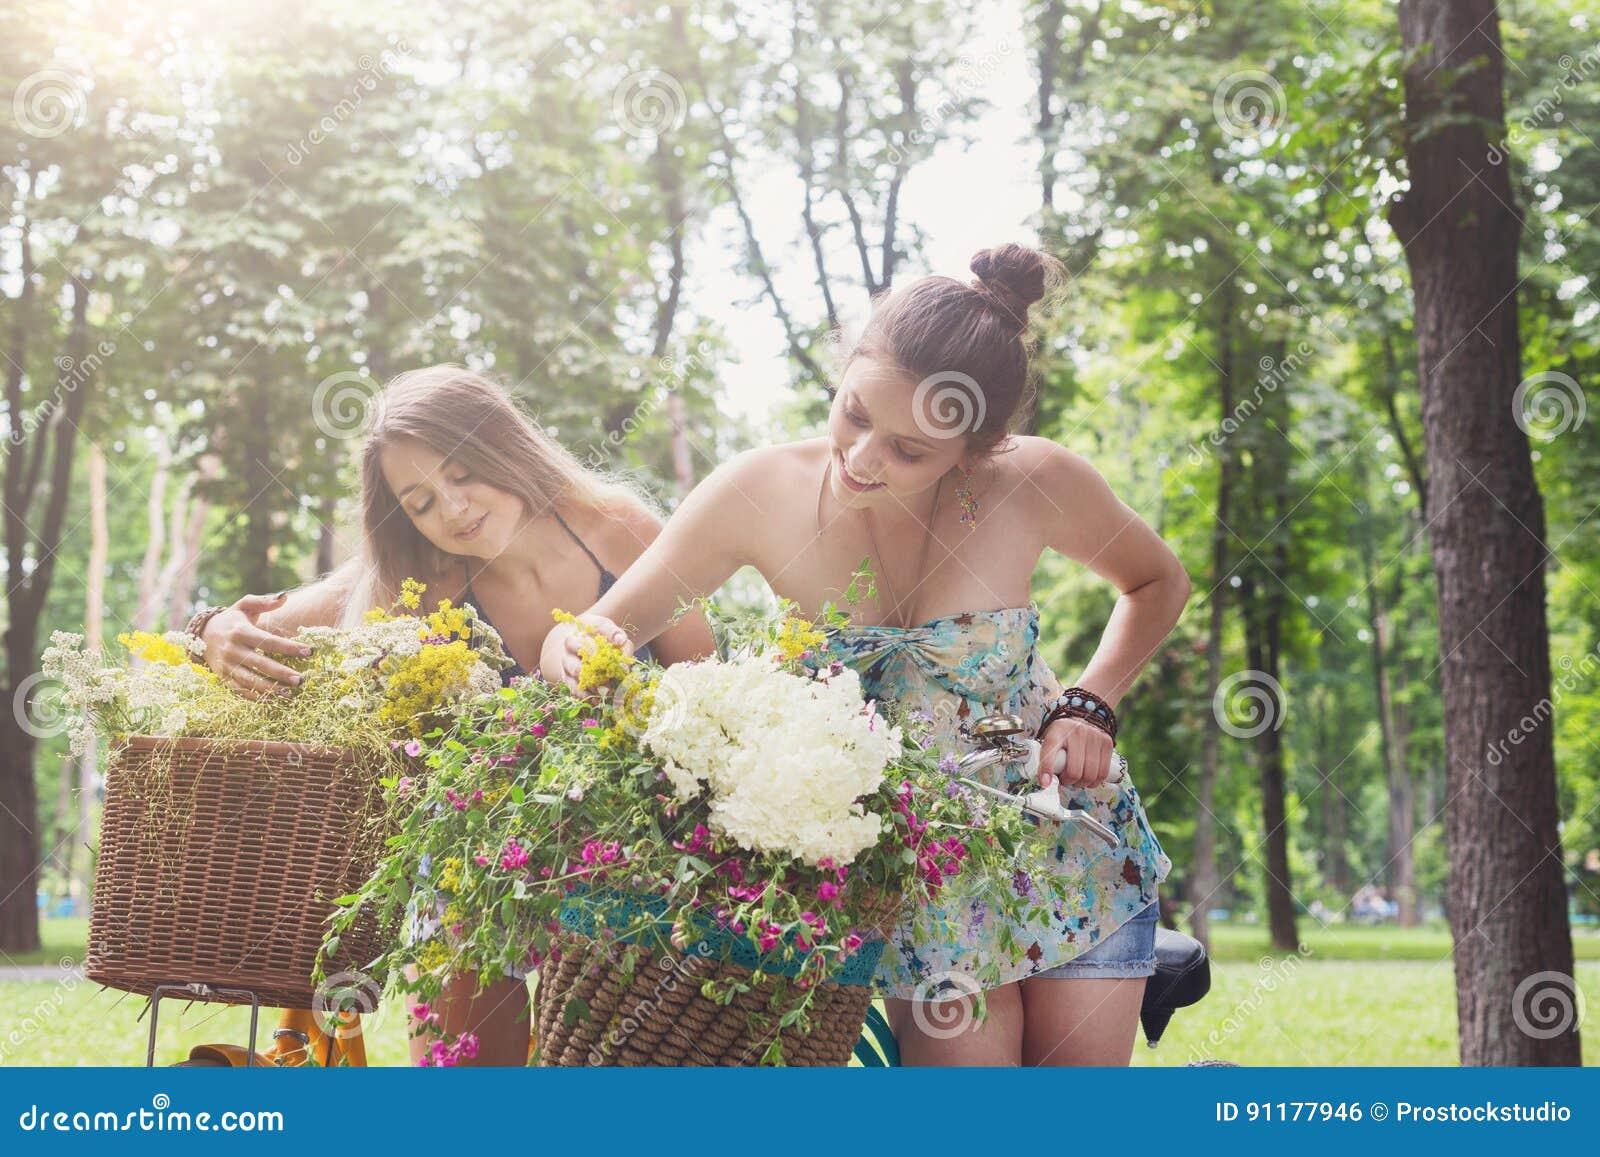 Happy boho chic girls gather wild flowers on bicycle ride